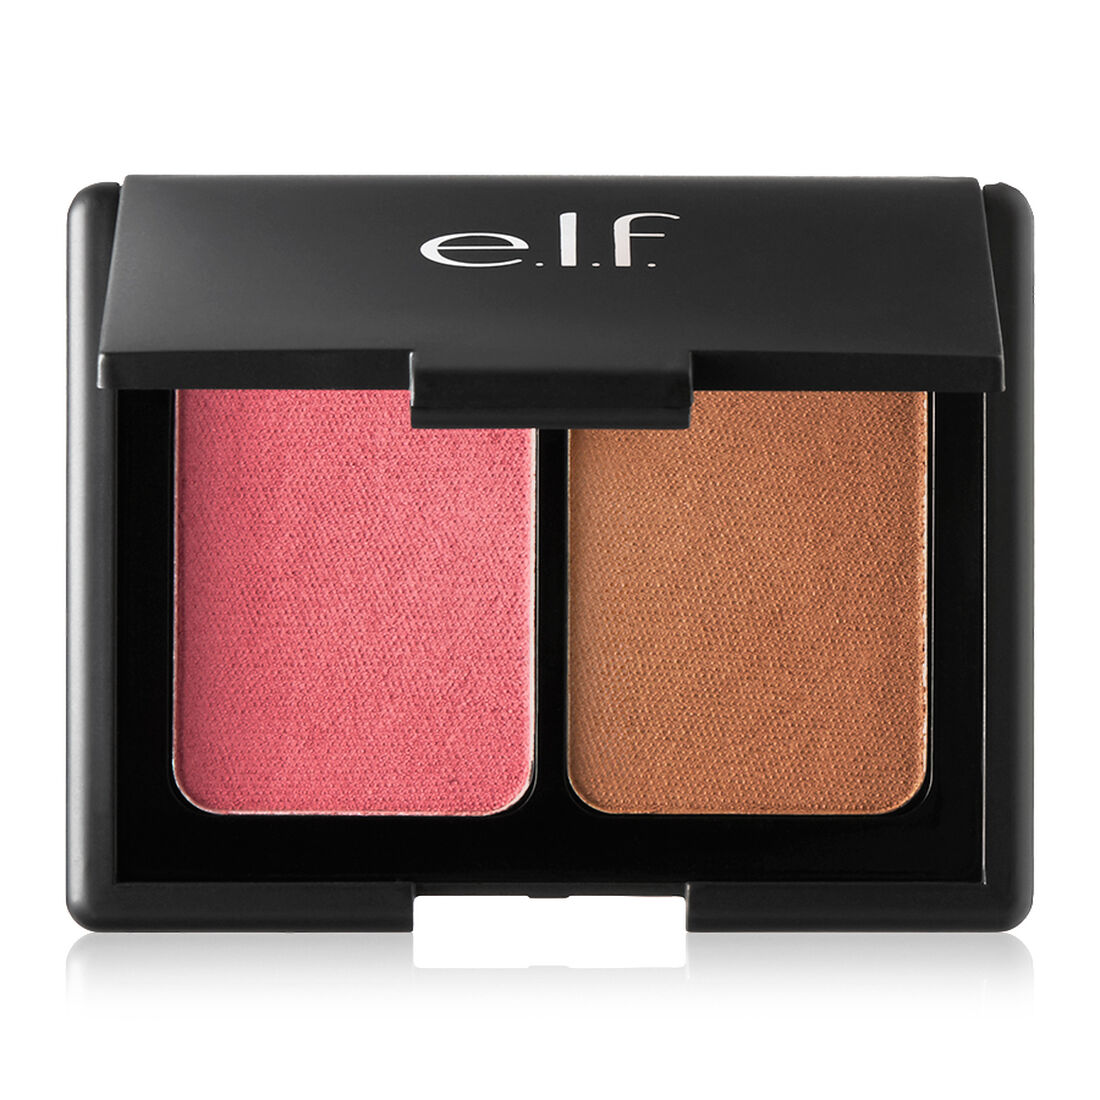 ELF Cosmetics - Aqua Beauty Blush & Bronzer